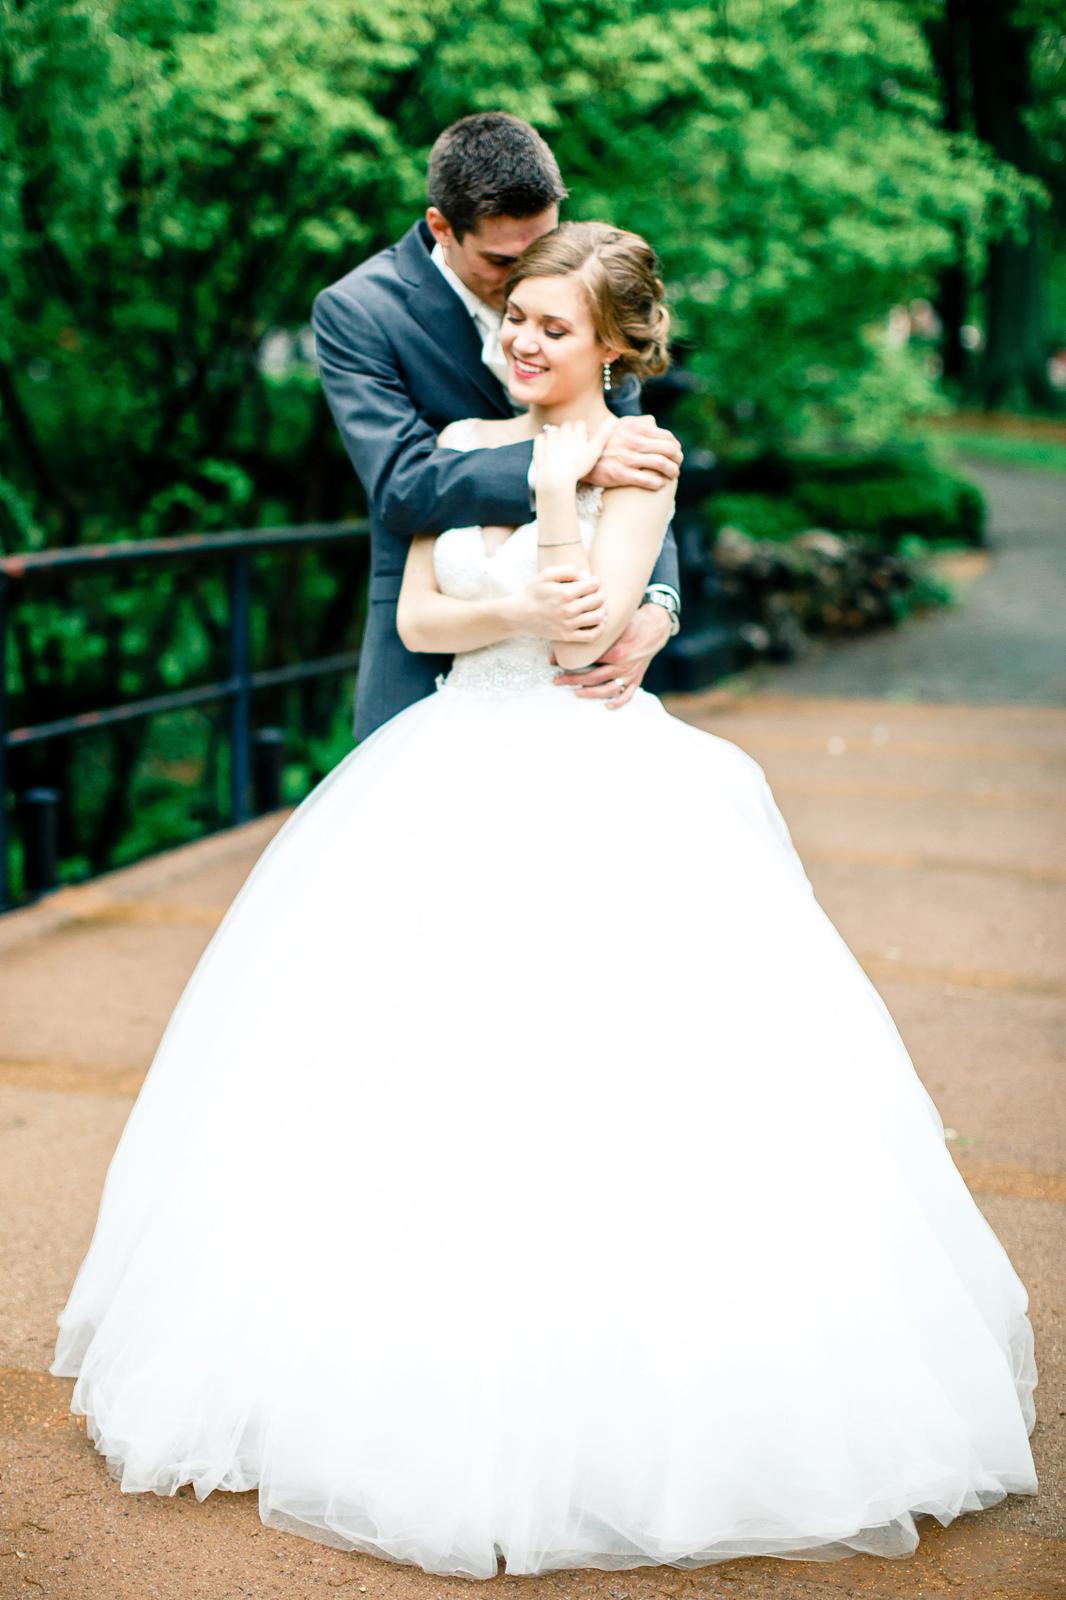 Bridal Portraits Lafayette Square Park Bride Groom St Louis Wedding Photographer Oldani Photography 3.jpg